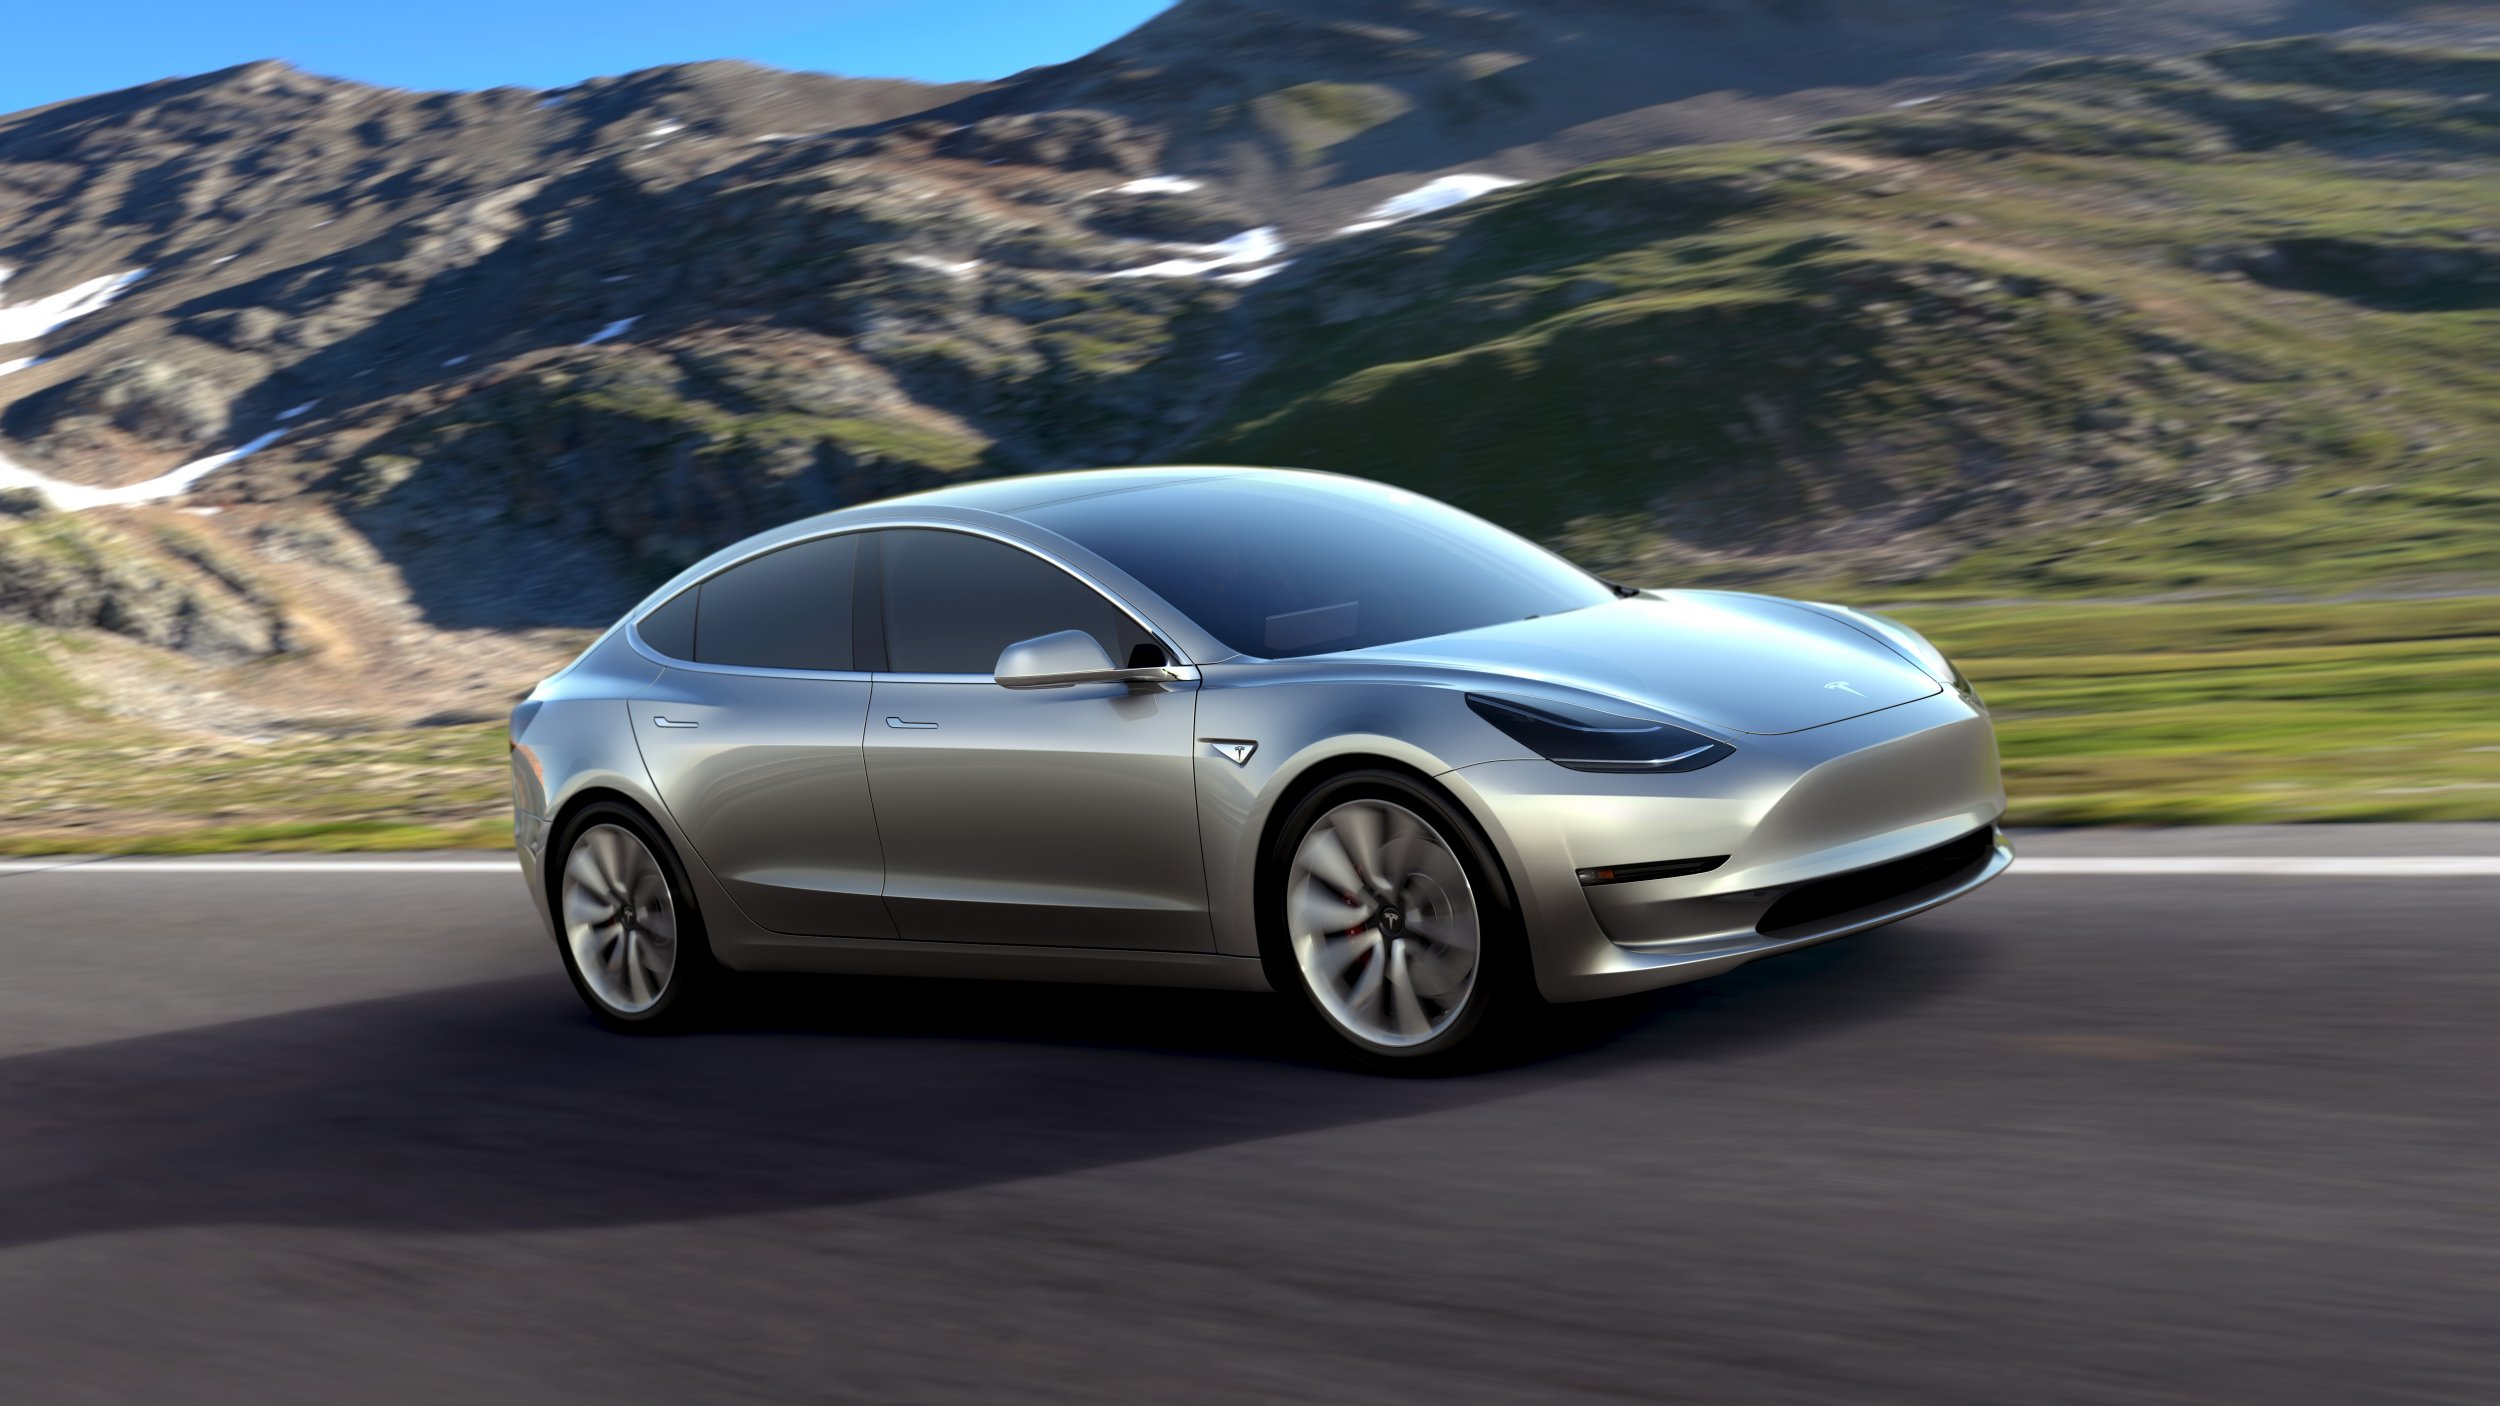 Tesla Model 3 Elon Musk Most Por Electric Car